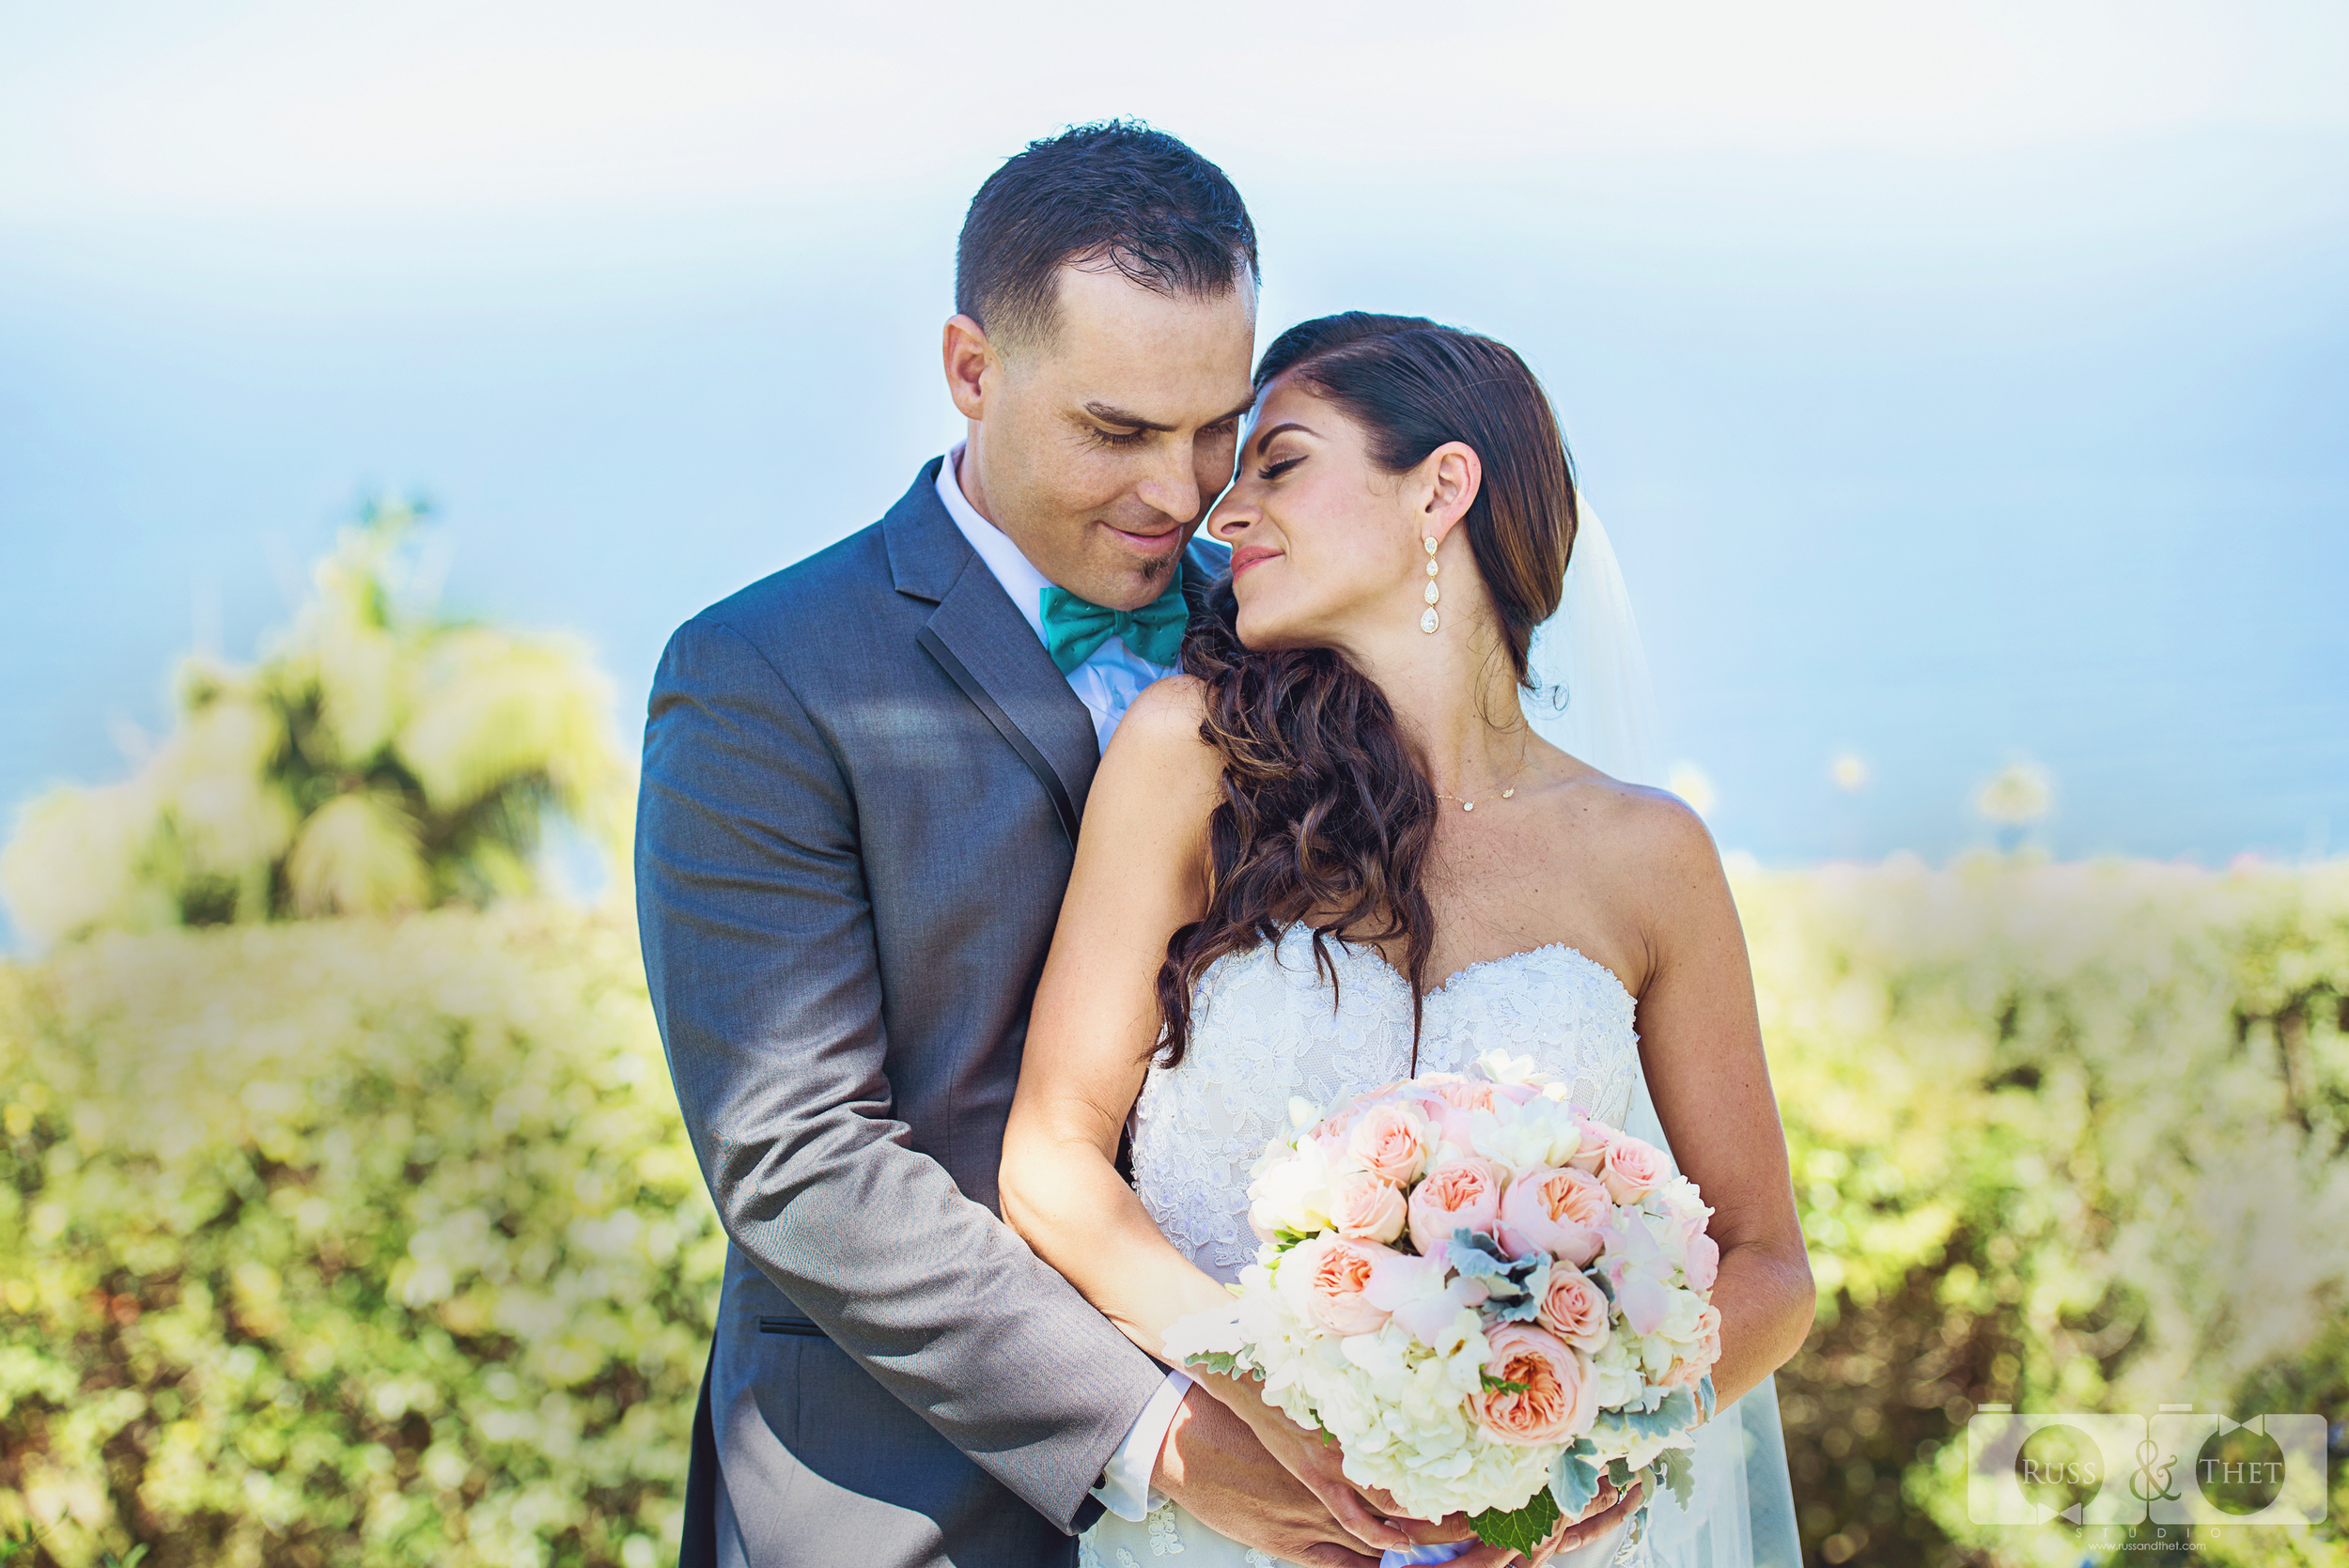 manhattan-beach-wedding-photographer_37.jpg